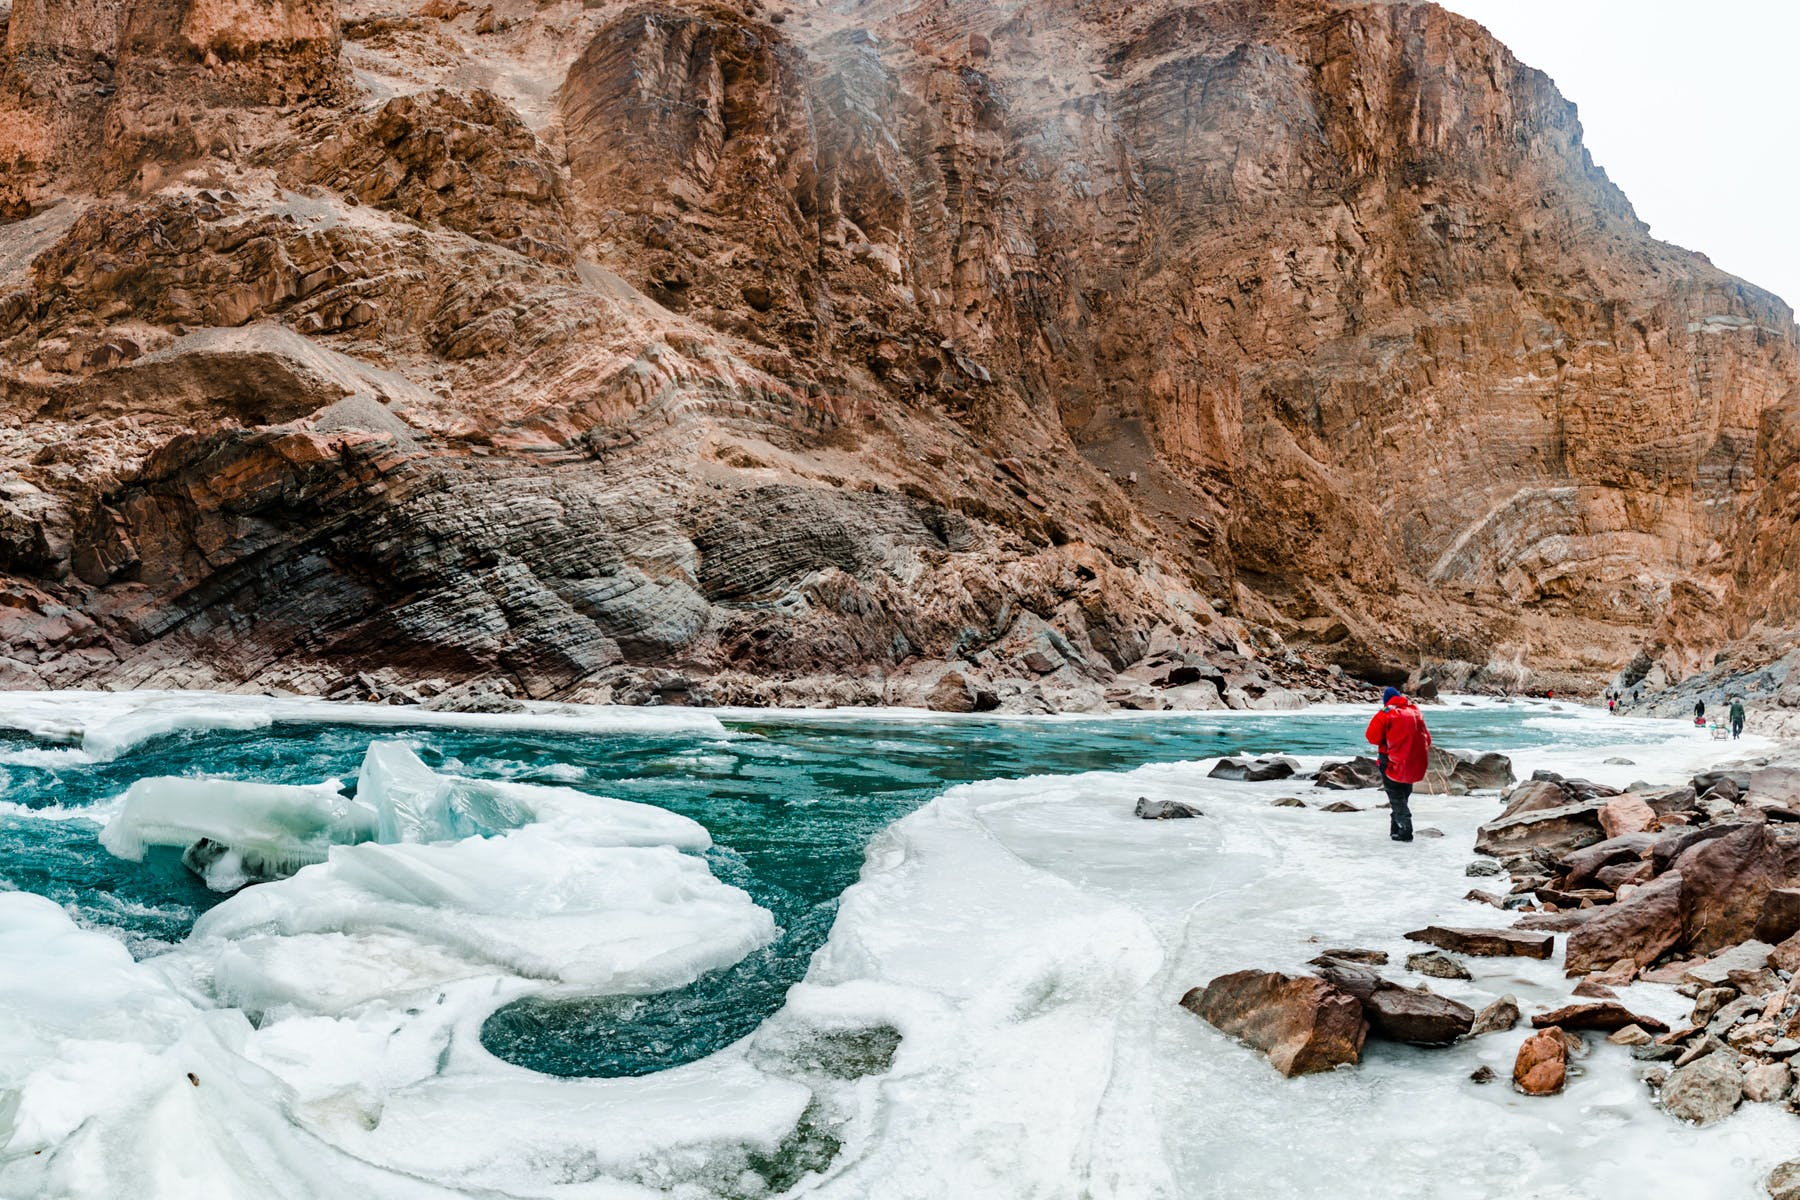 Ladakh: an unusual holiday destination in India